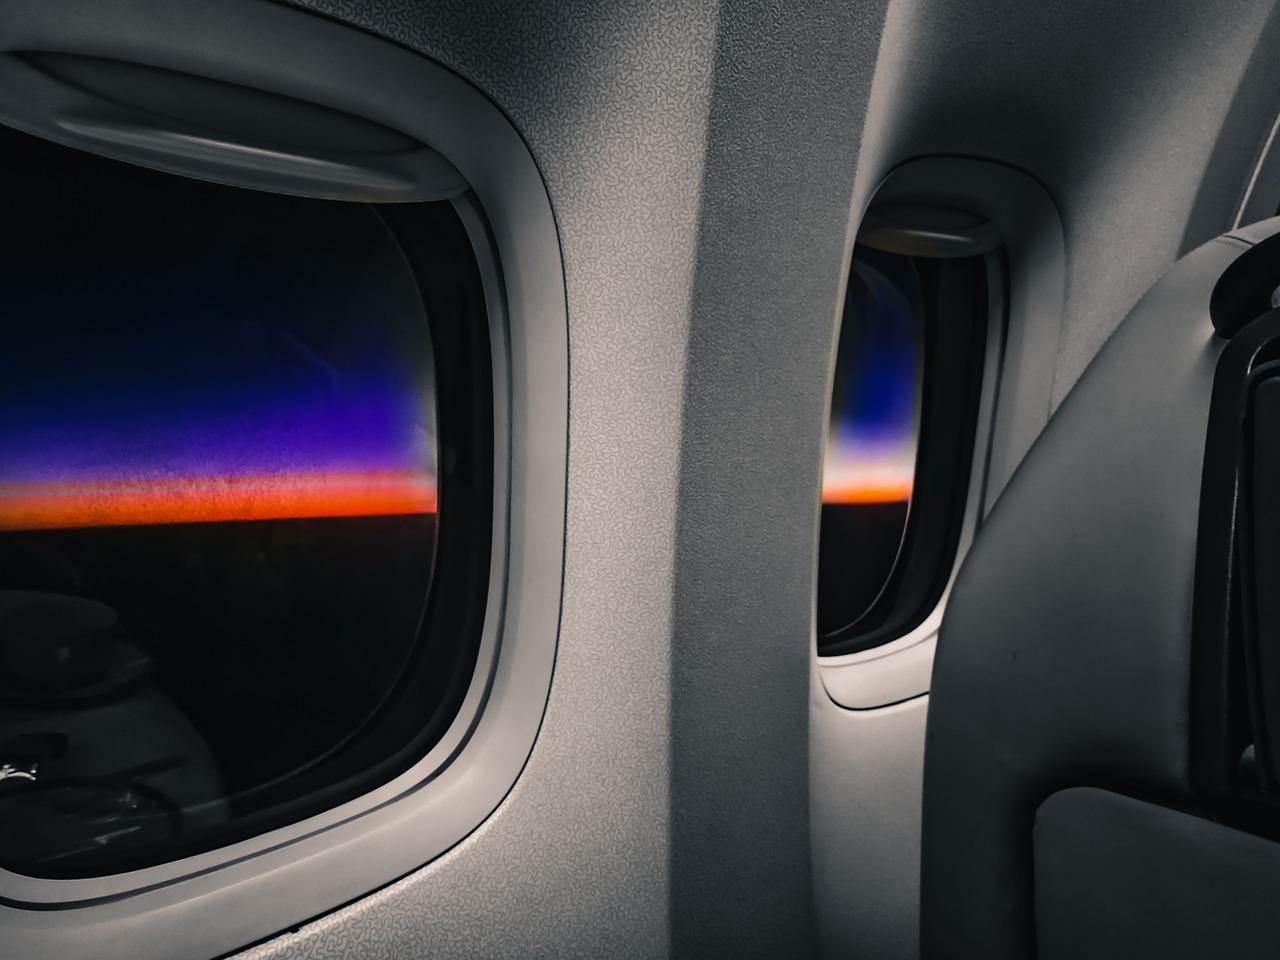 airplane window shade